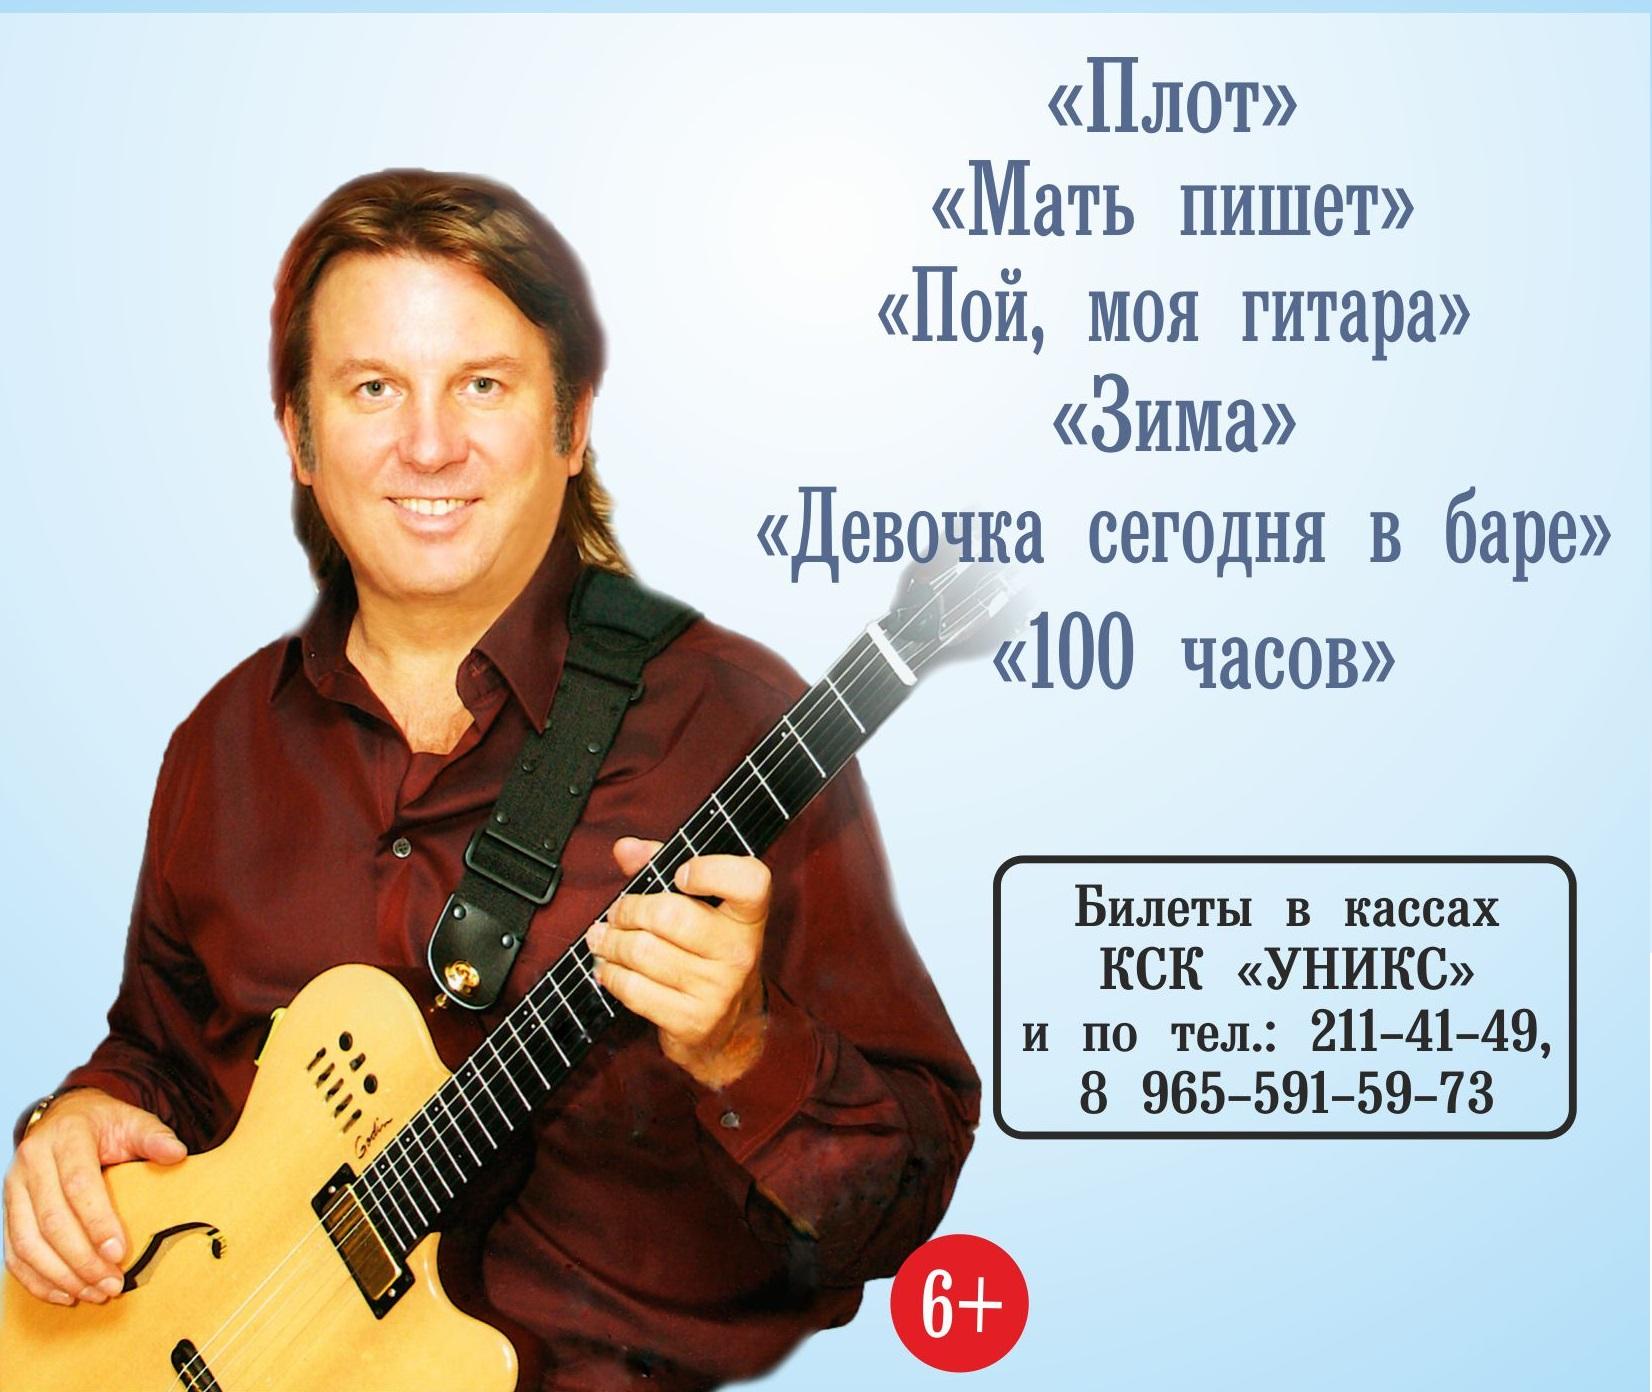 smallАфиша Ю. Лоза